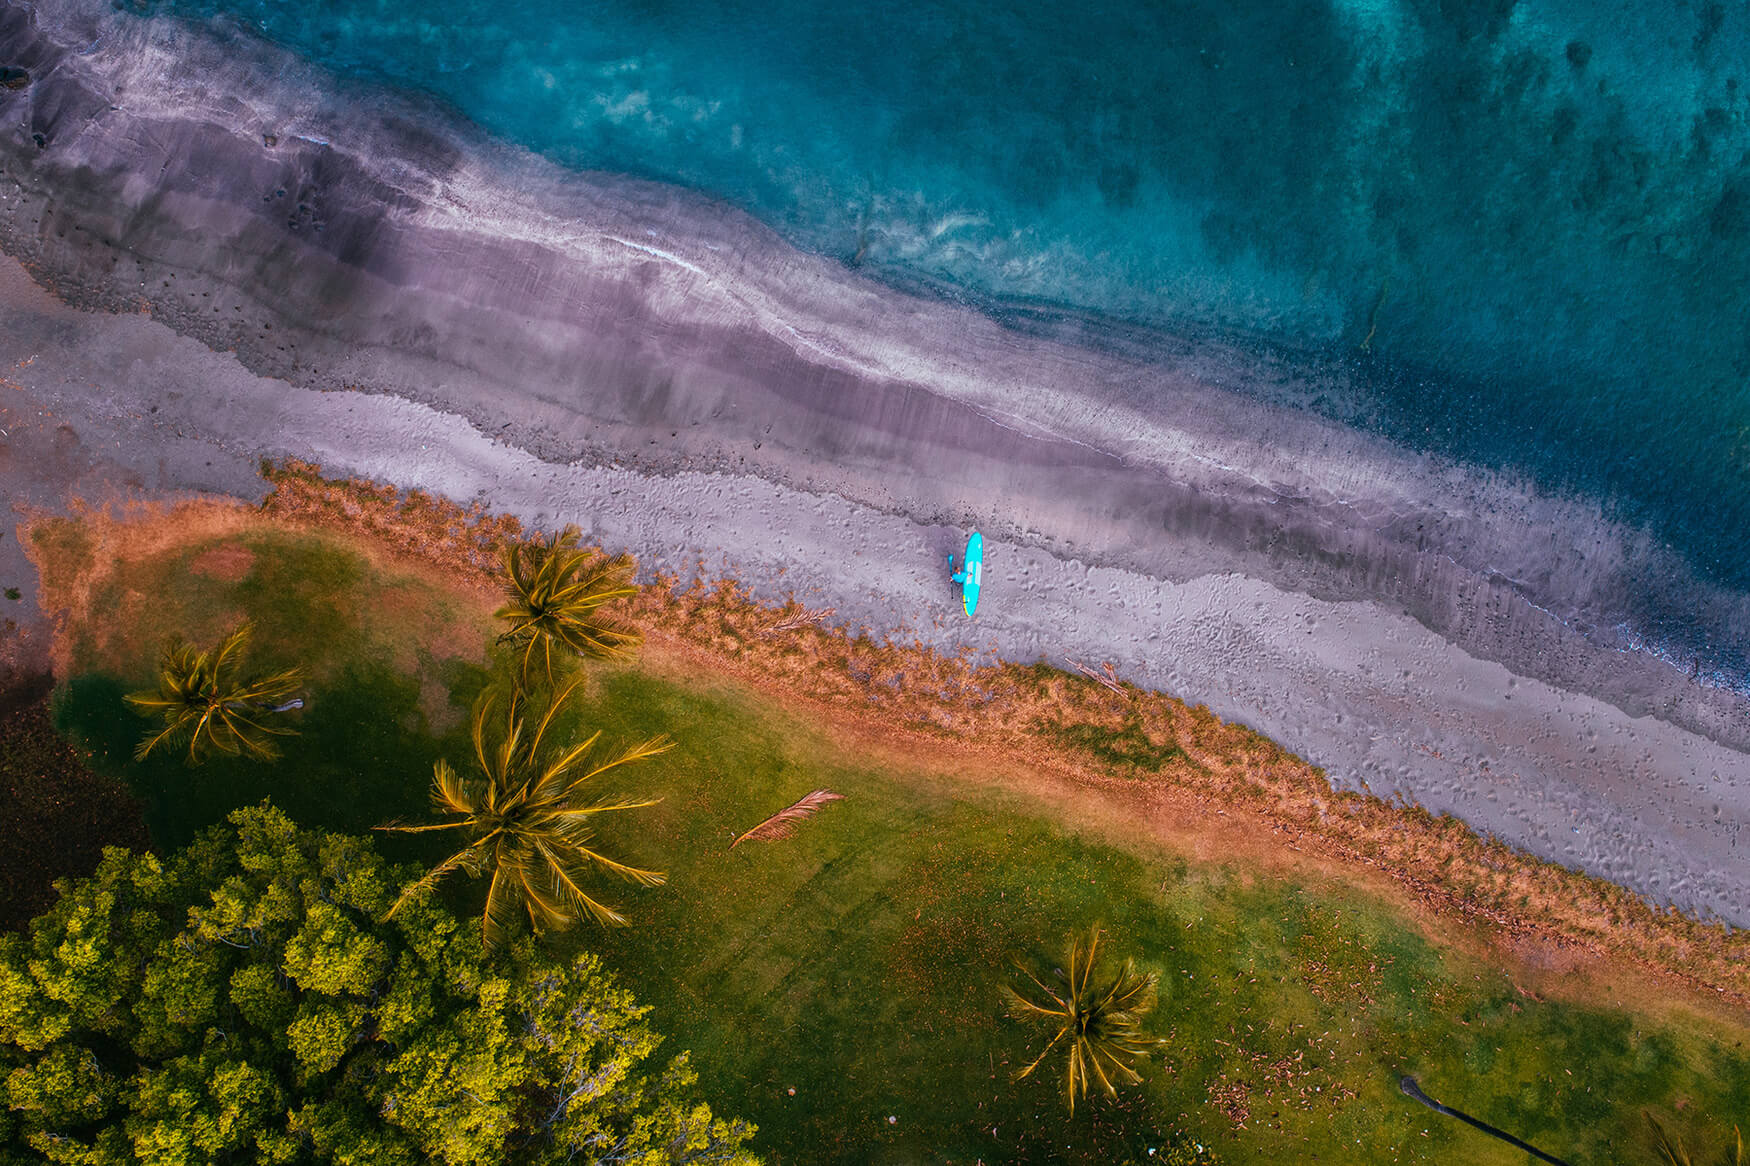 Klaas FlyAirPocketDJI 0521-Maui2019-Fanatic-Duotone-marcusfriedrich.media